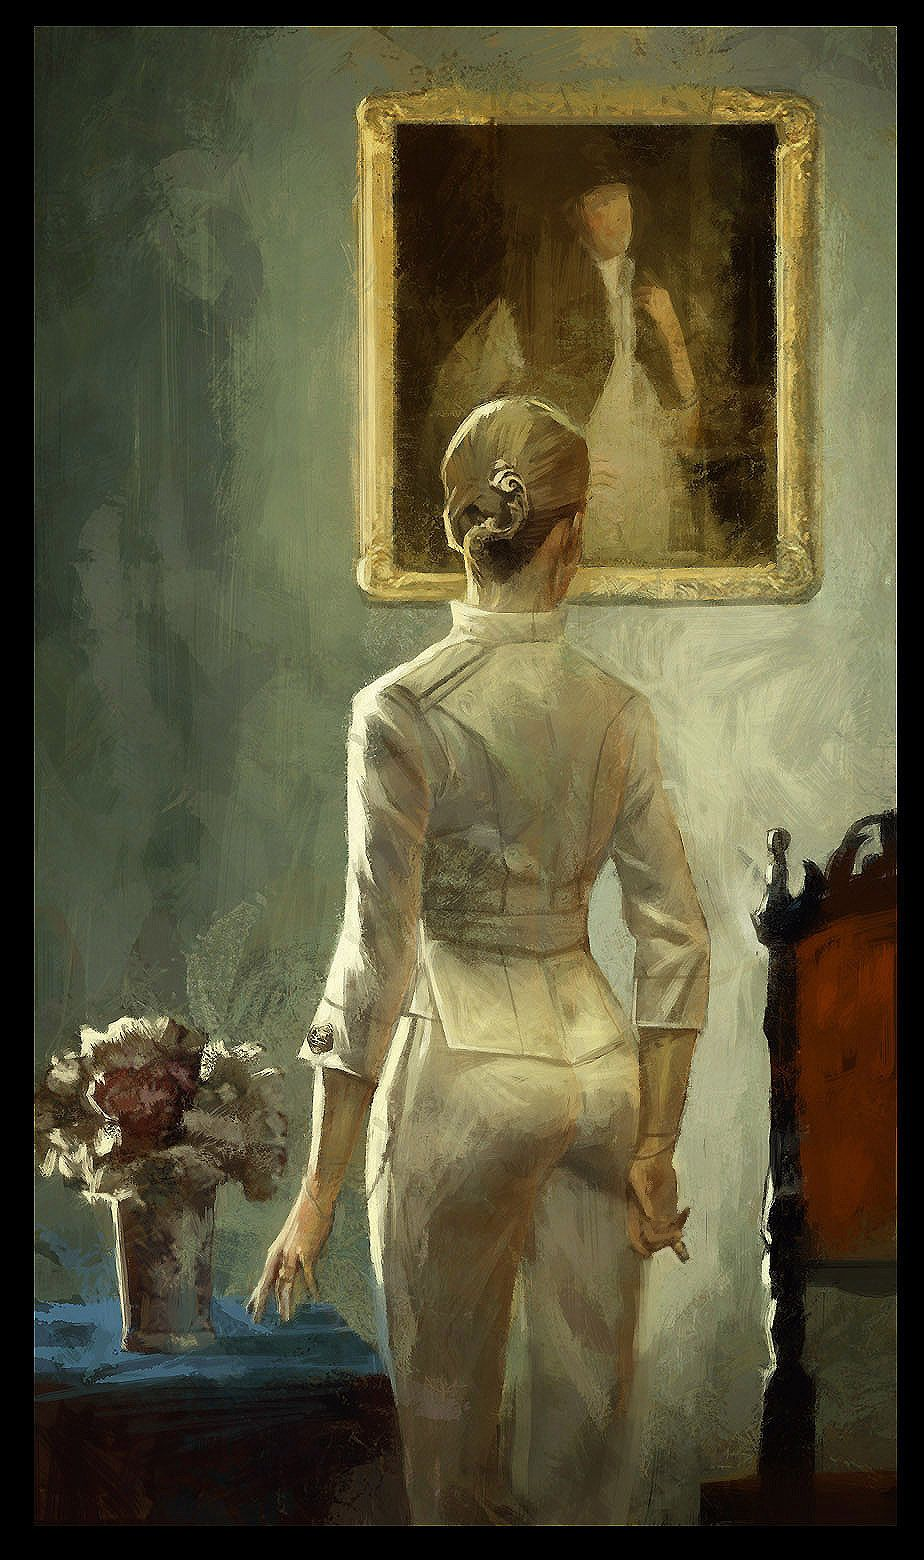 Anton Sokolov Sokolov S Paintings Art Character Art Painting